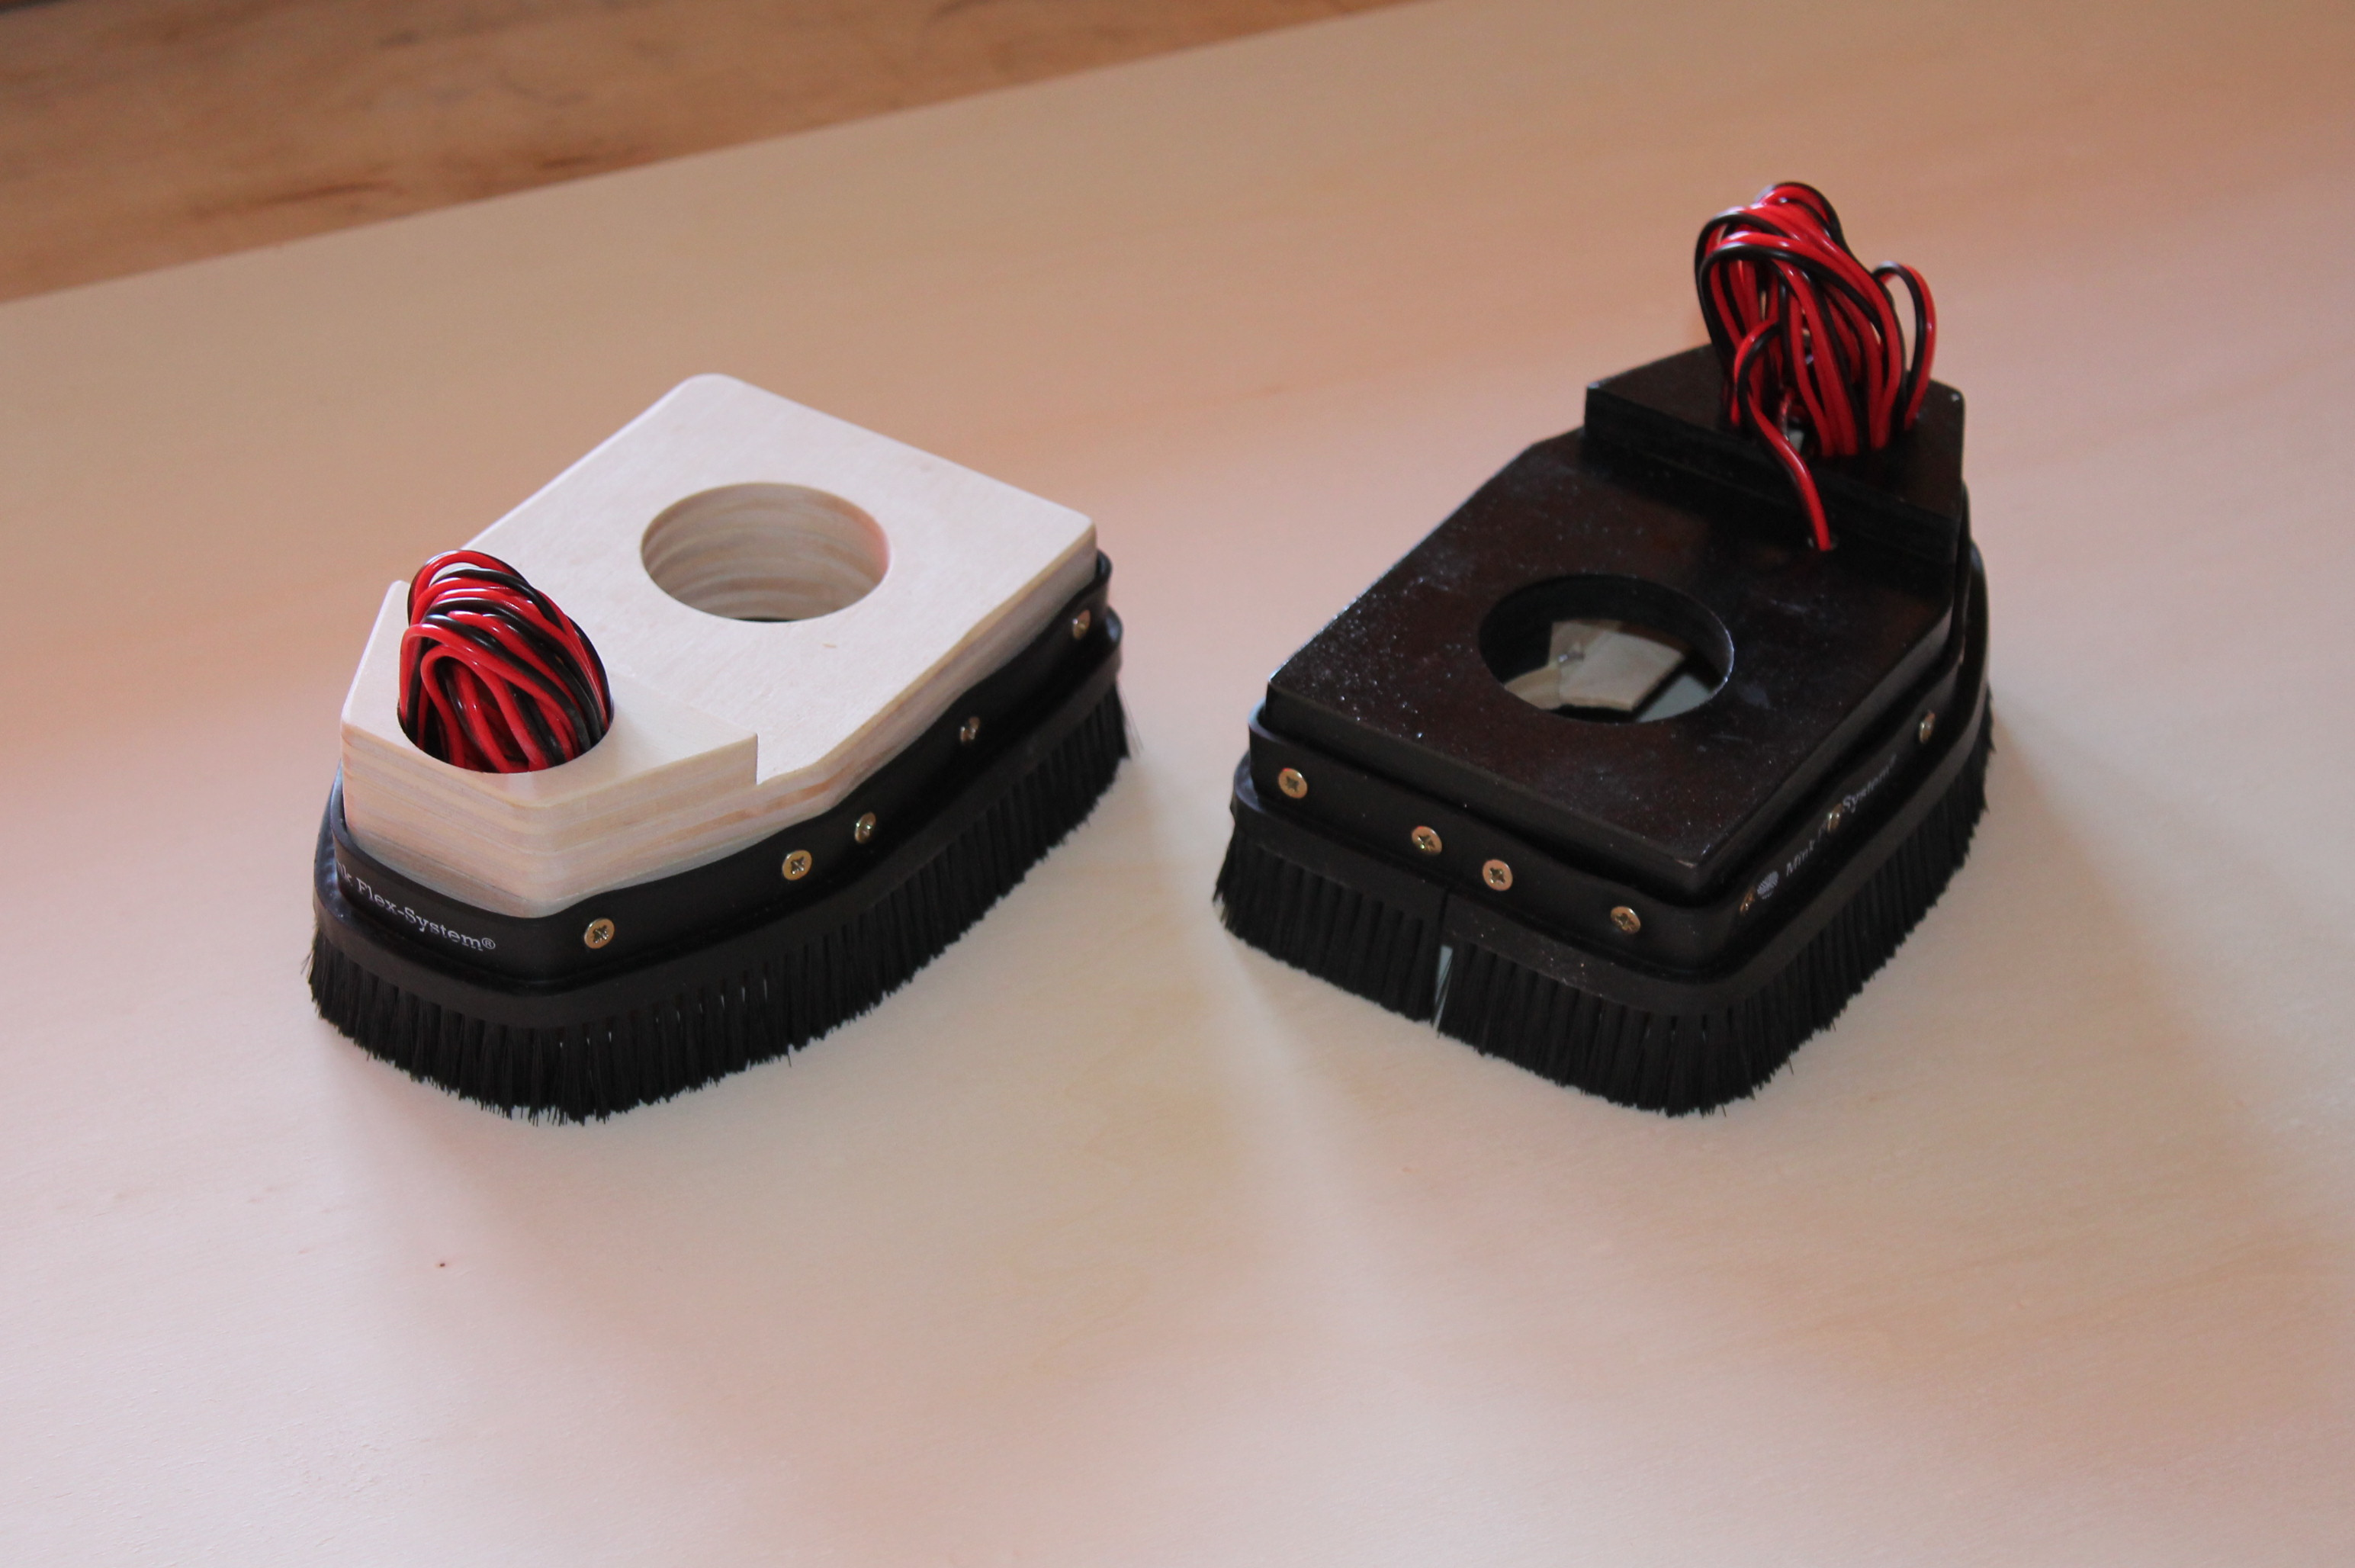 Led Beleuchtung Modellbau Anleitung | Cnc Frase Absaugung Iii Mit Bursten Und Led Beleuchtung 43mm